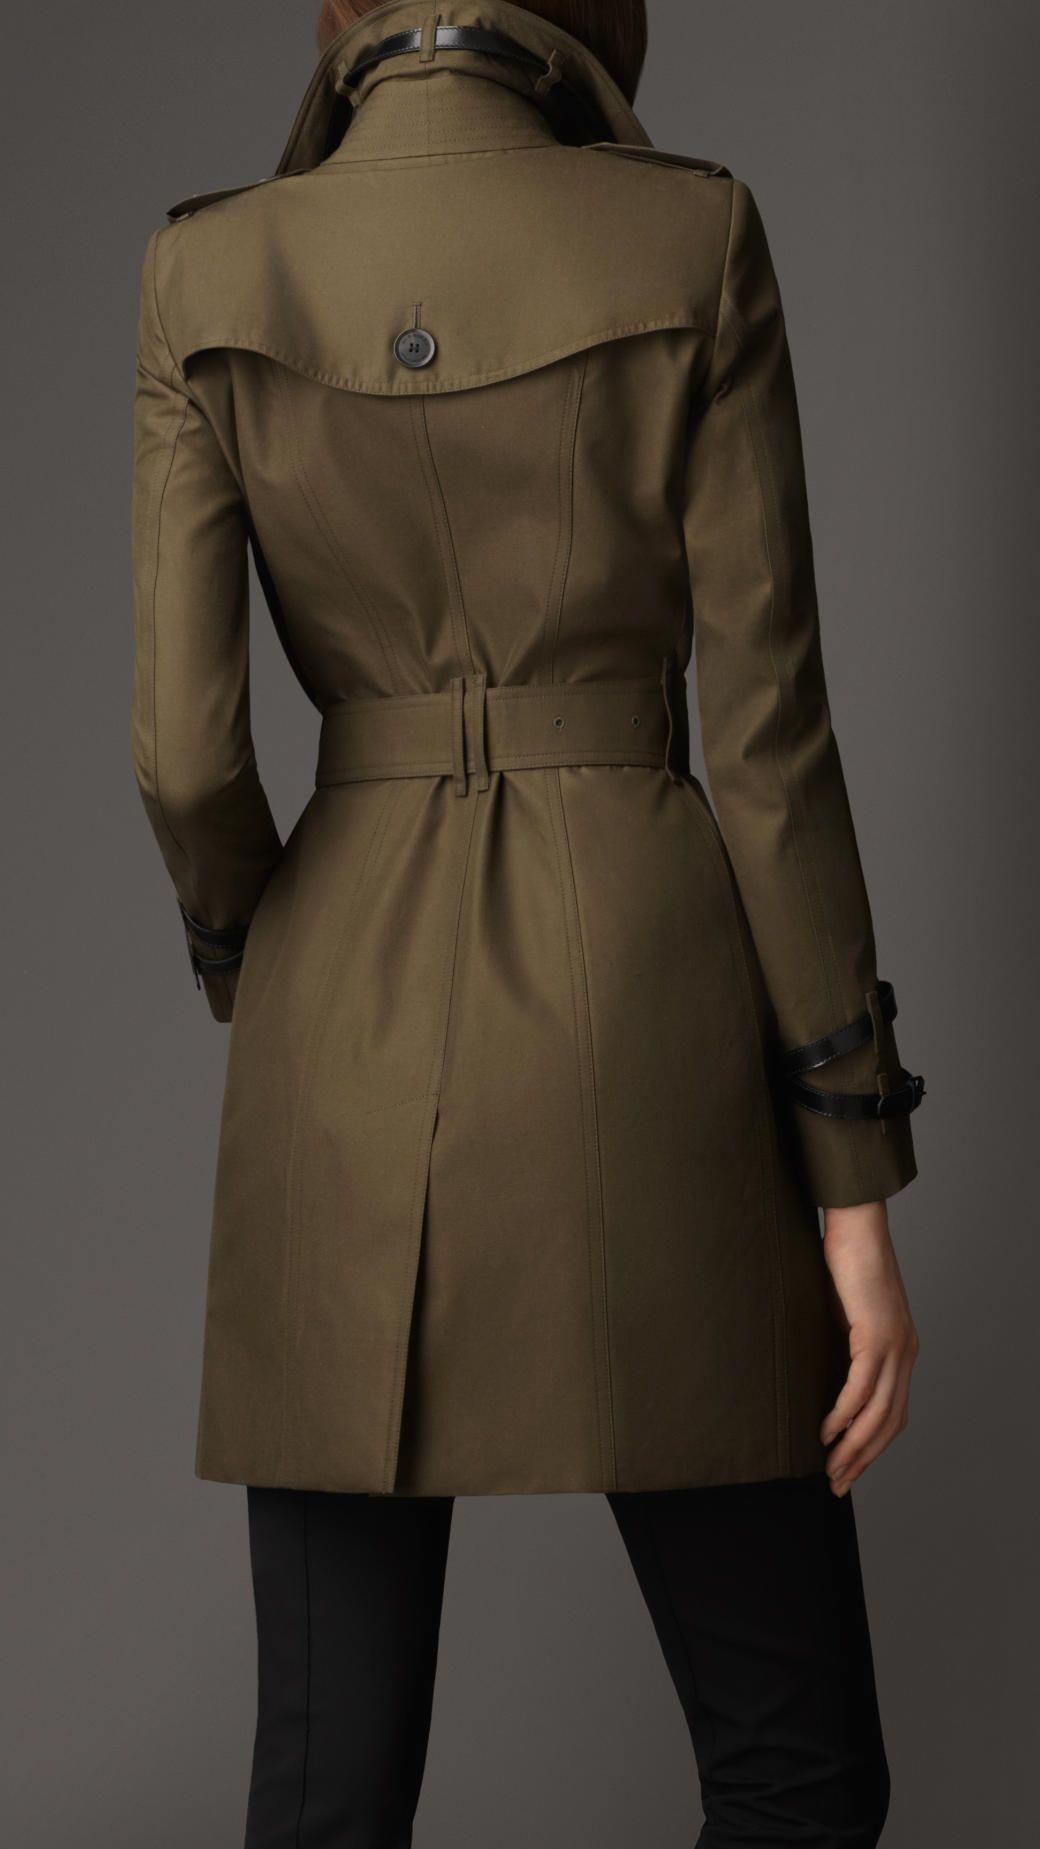 Trench Coats For Women Burberry Trench Coats Women Coat Trench Coat